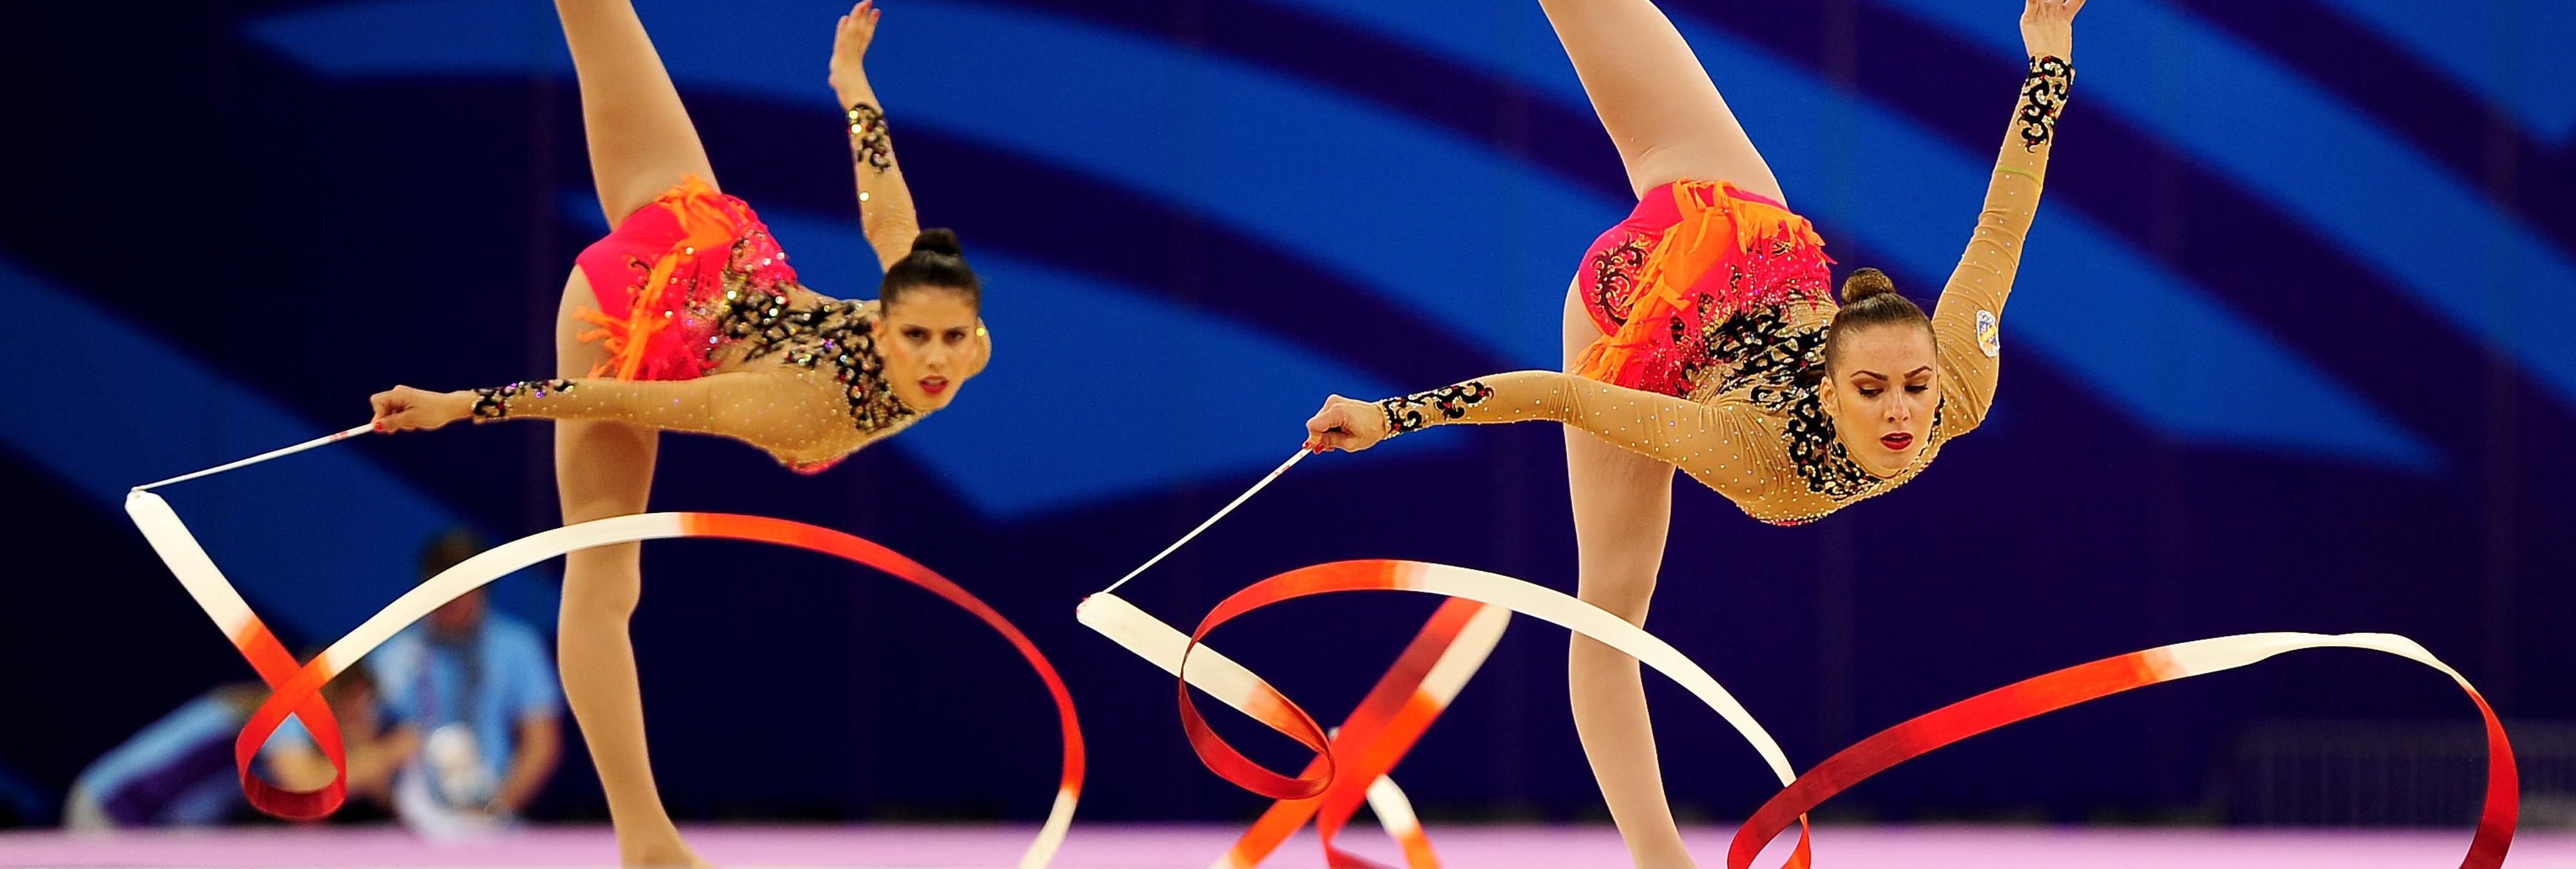 No han acaparado portadas, pero las españolas de gimnasia rítmica han vuelto a ganar un mundial